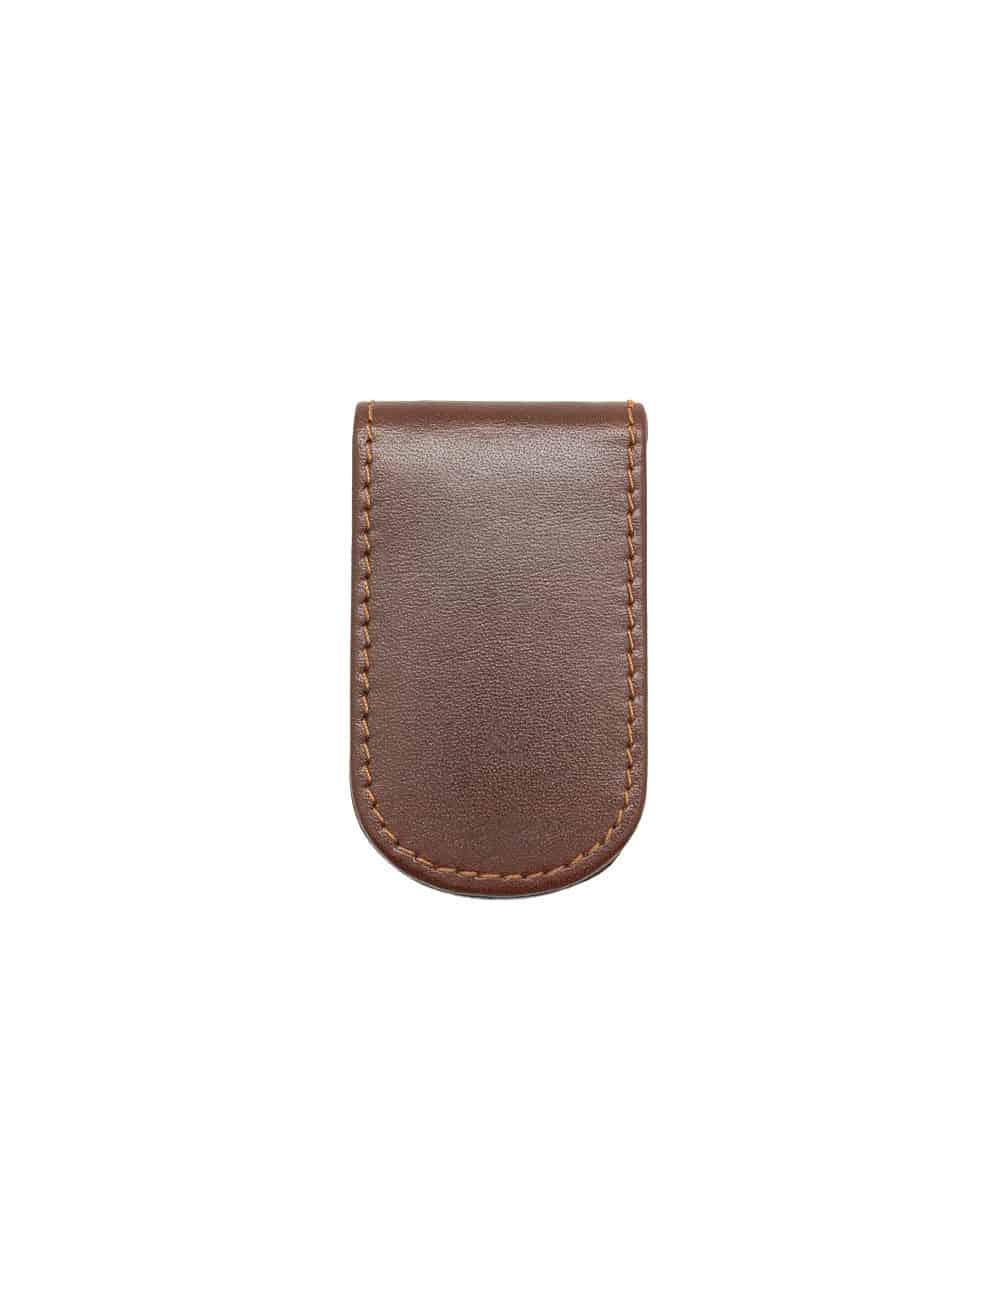 Dark Brown 100% Genuine Top Grain Leather Money Clip SLG1.NOB1